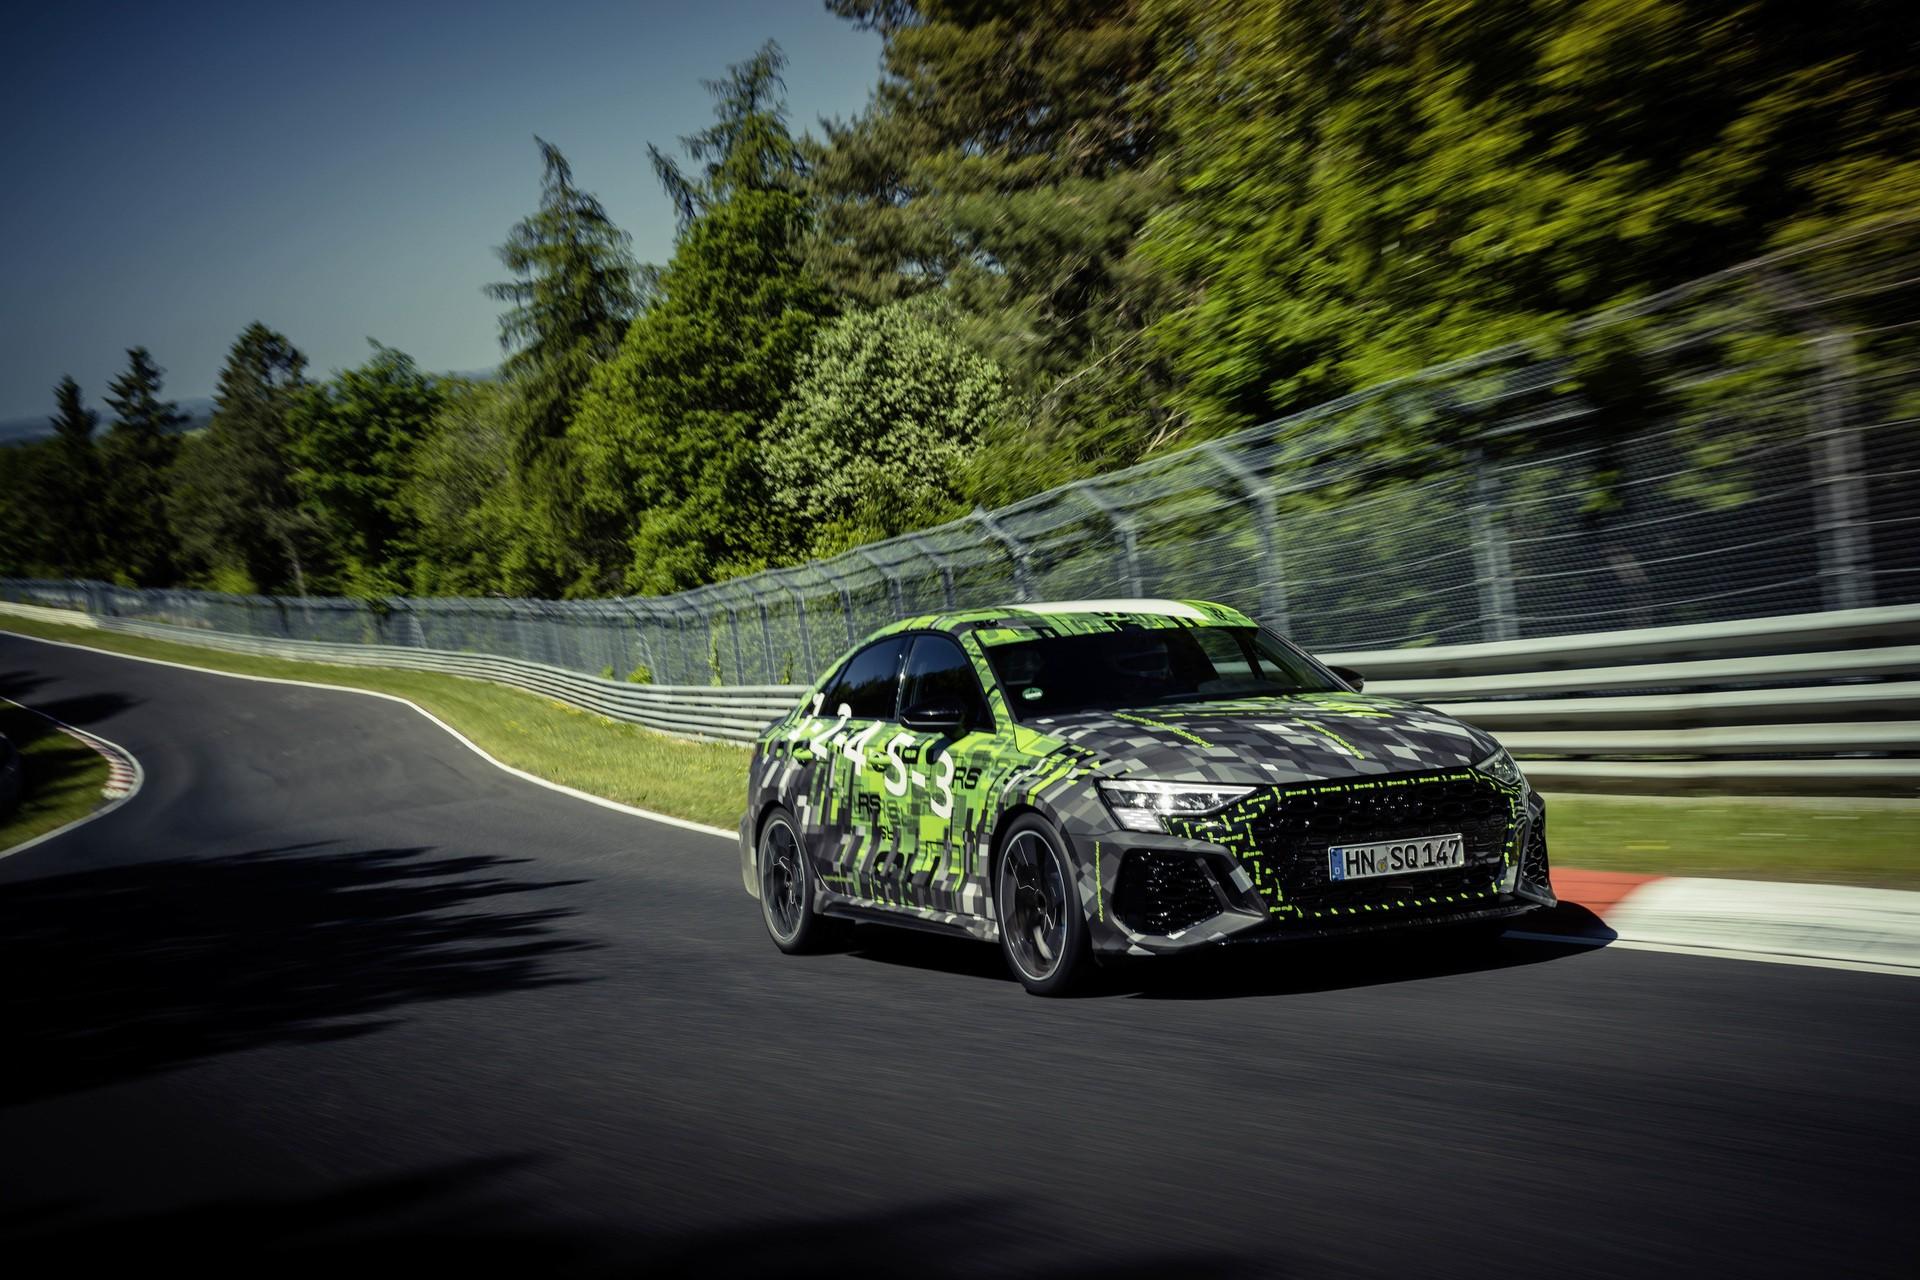 Audi_RS3_Sedan_Nurburgring_lap_record-0013